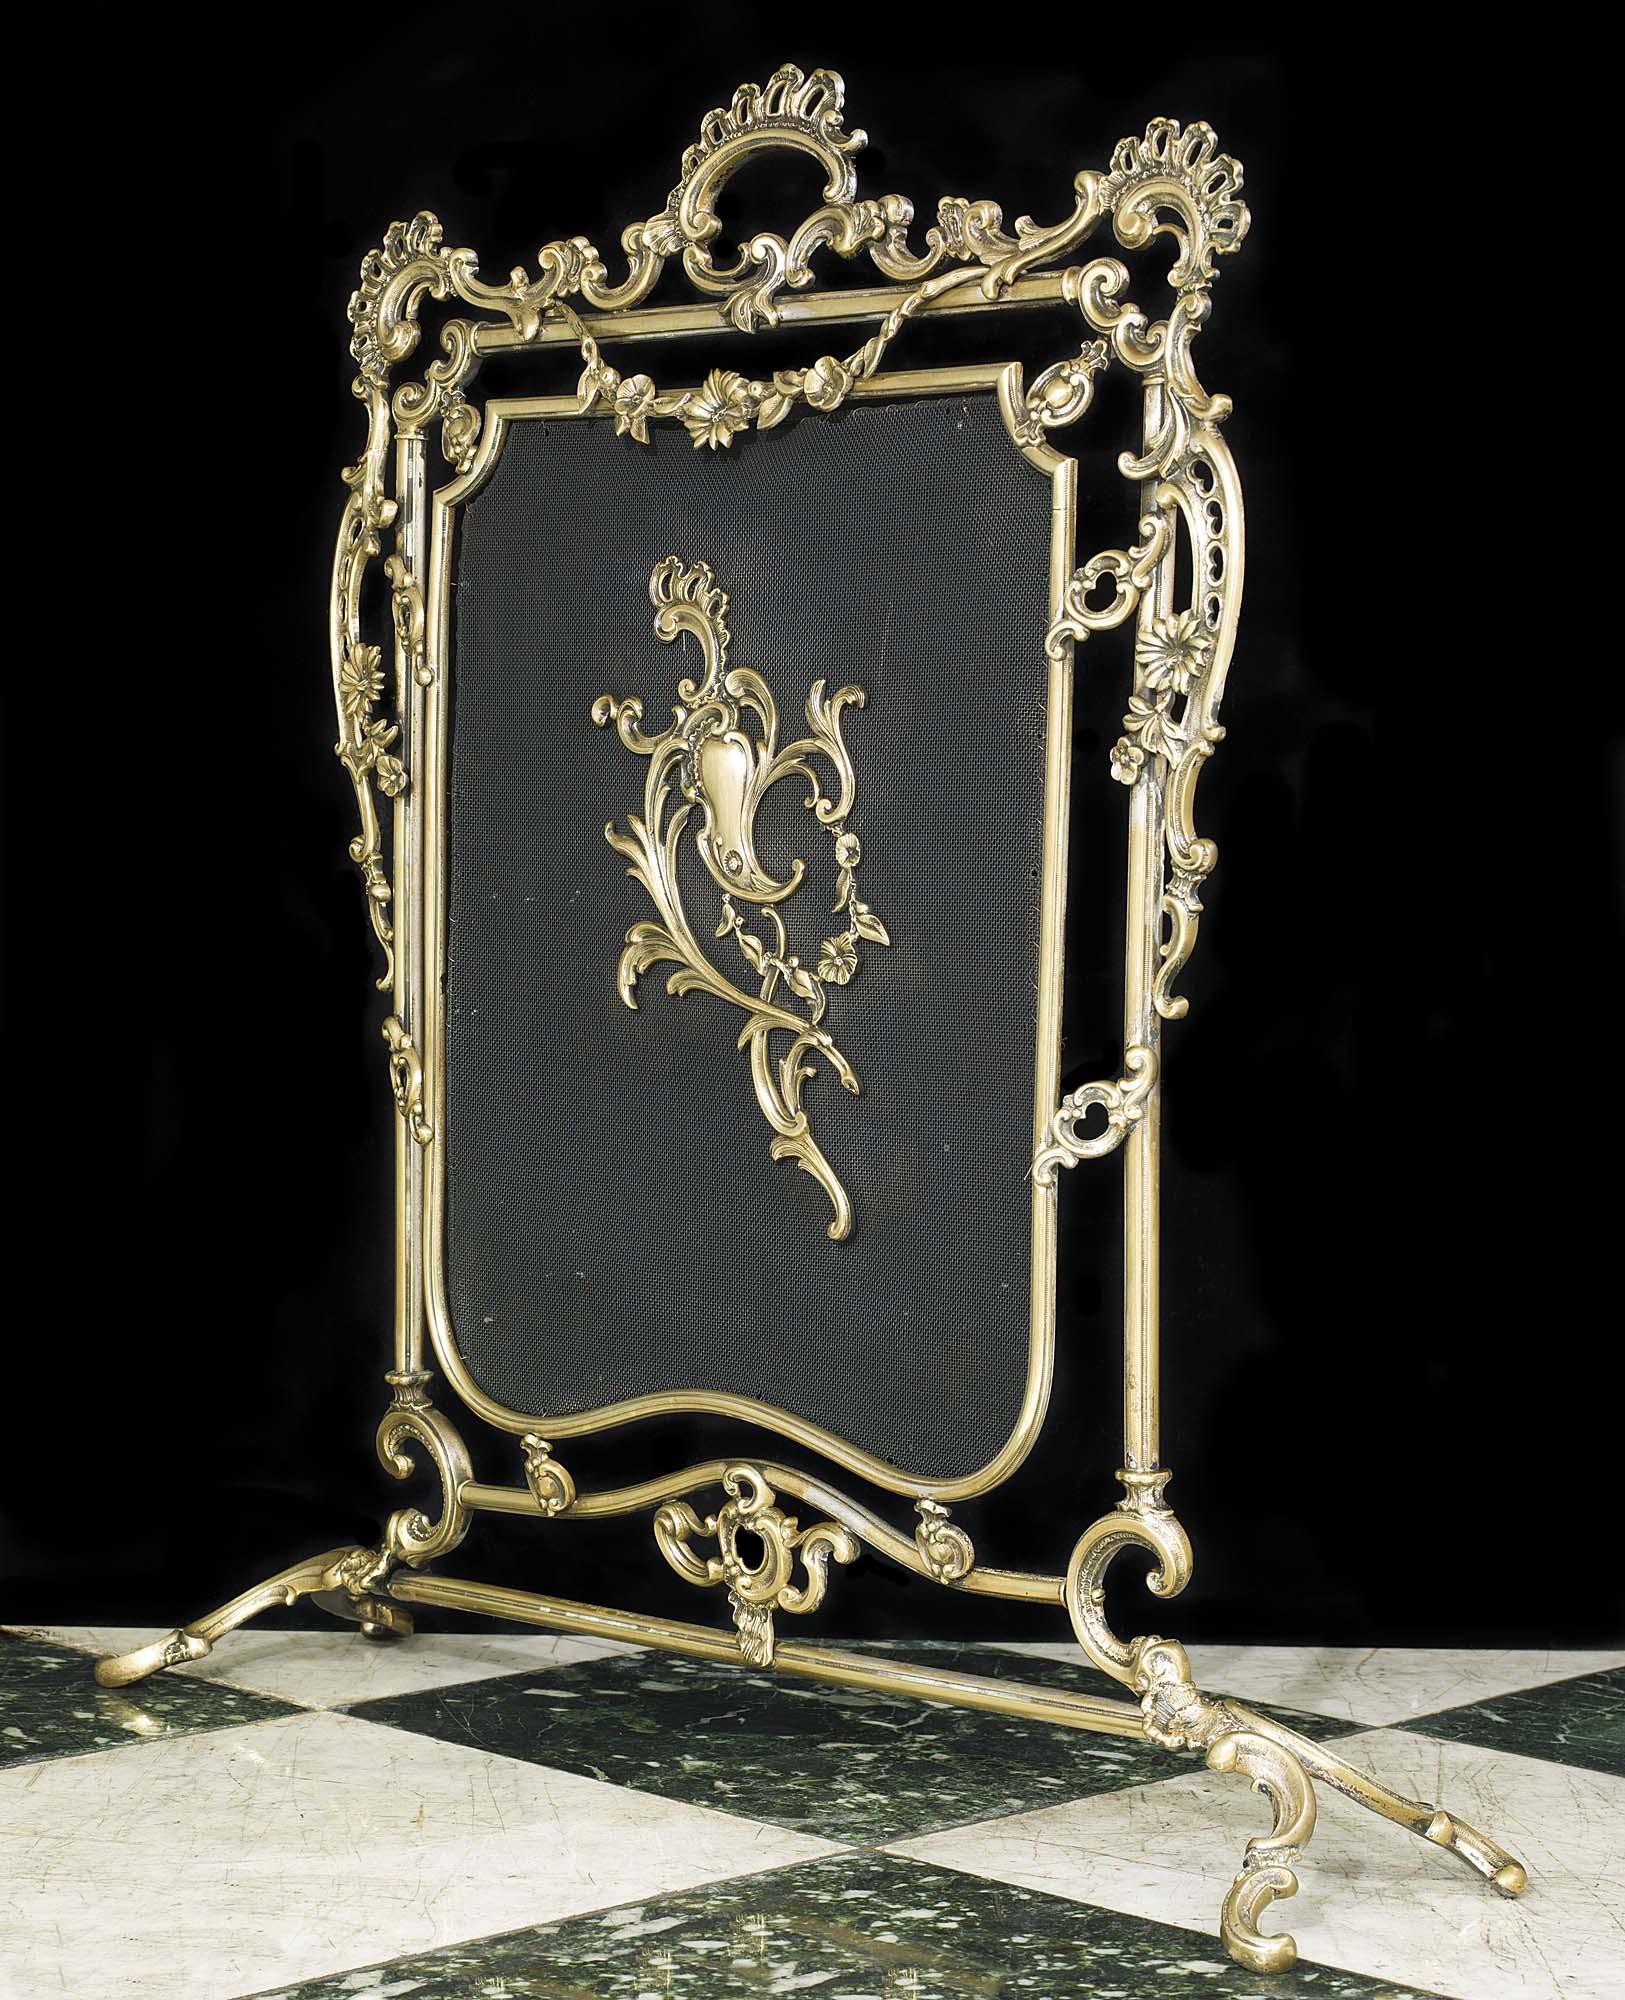 Antiqued Brass Fireplace Screen New Firegrates Rococo Firescreens